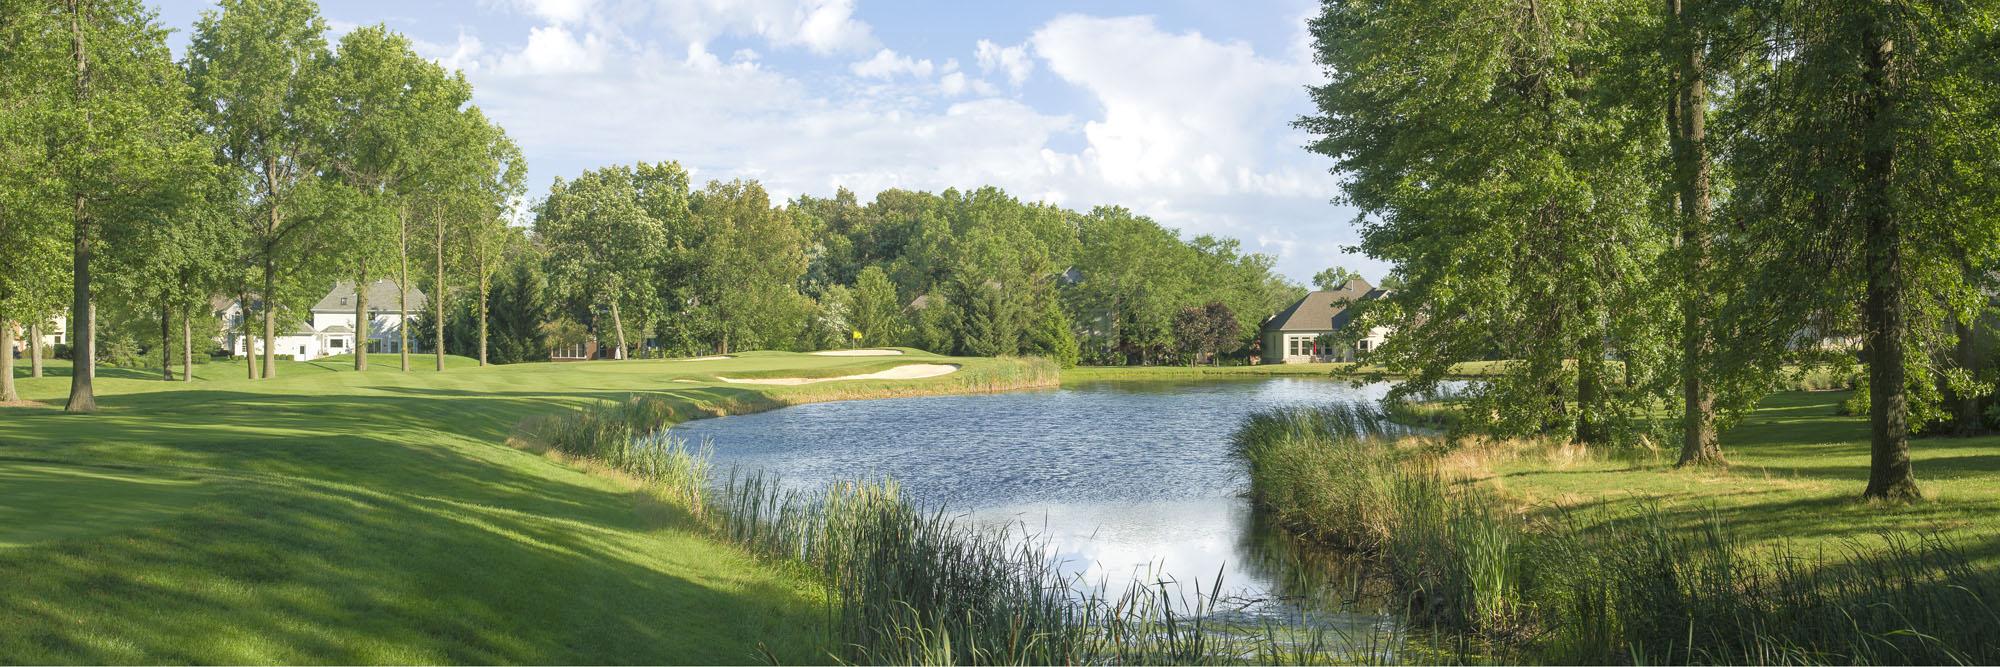 Golf Course Image - Jefferson Country Club No. 17